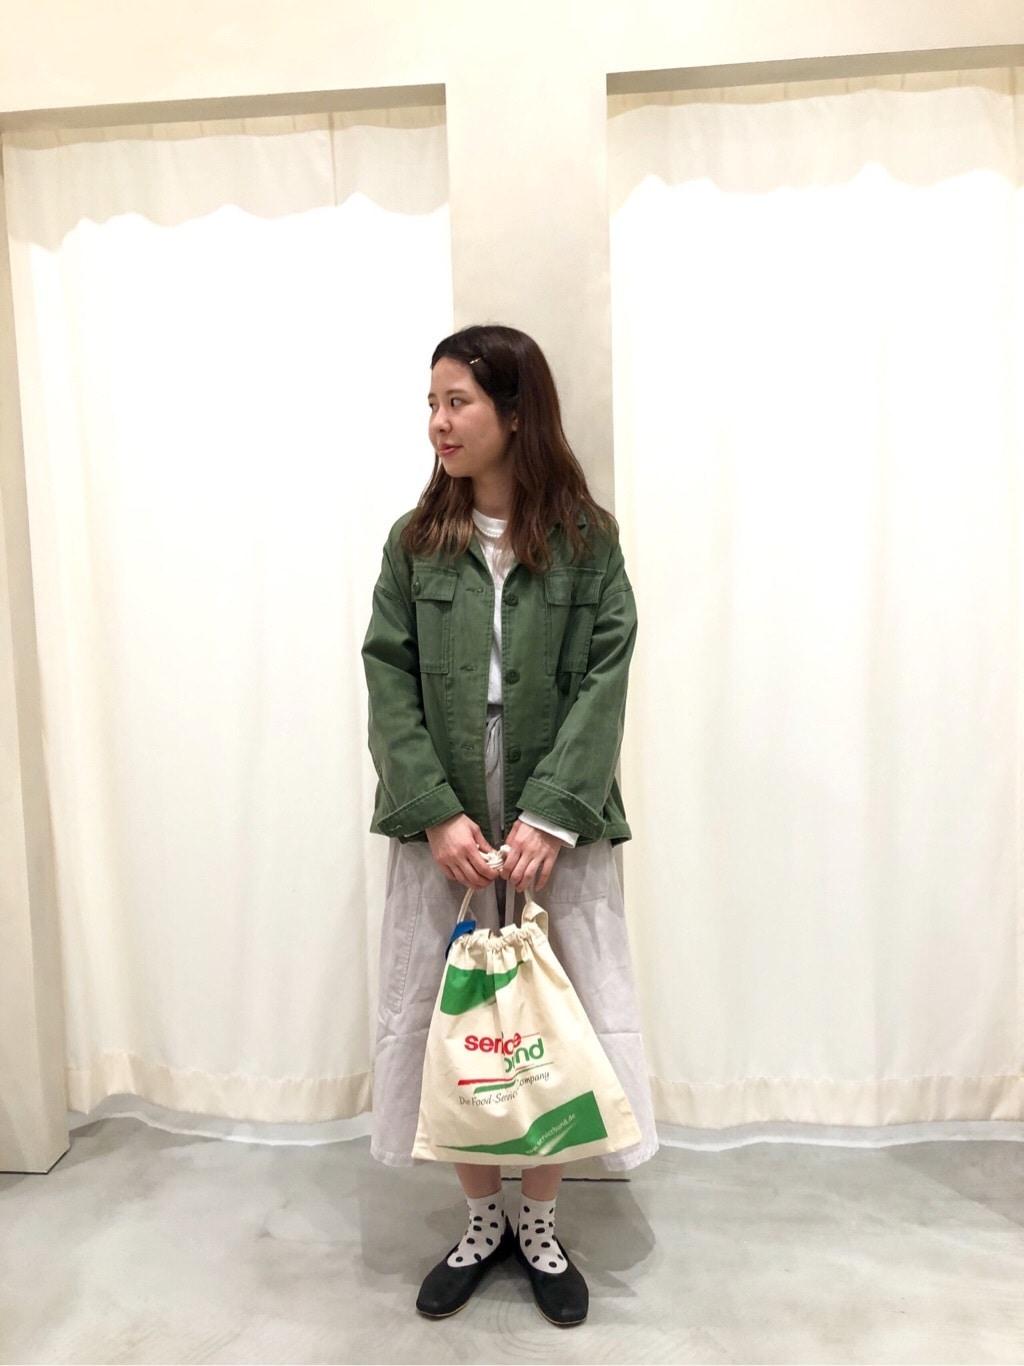 AMB SHOP CHILD WOMAN CHILD WOMAN , PAR ICI ルミネ横浜 身長:160cm 2020.03.25